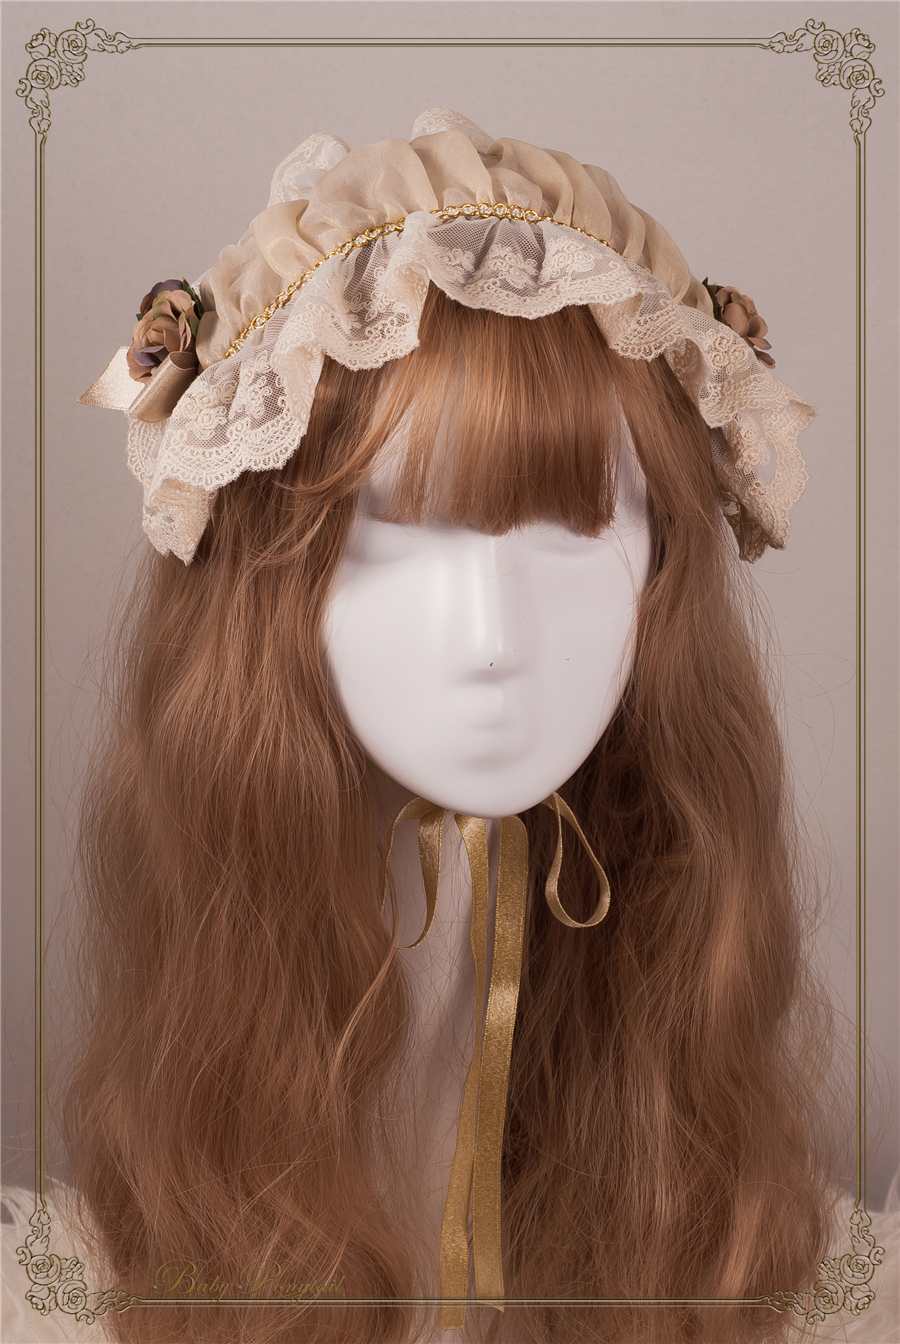 BabyPonytail_Rose Battle_Stock Photo_Petite Rose Head Dress Amber_7.jpg